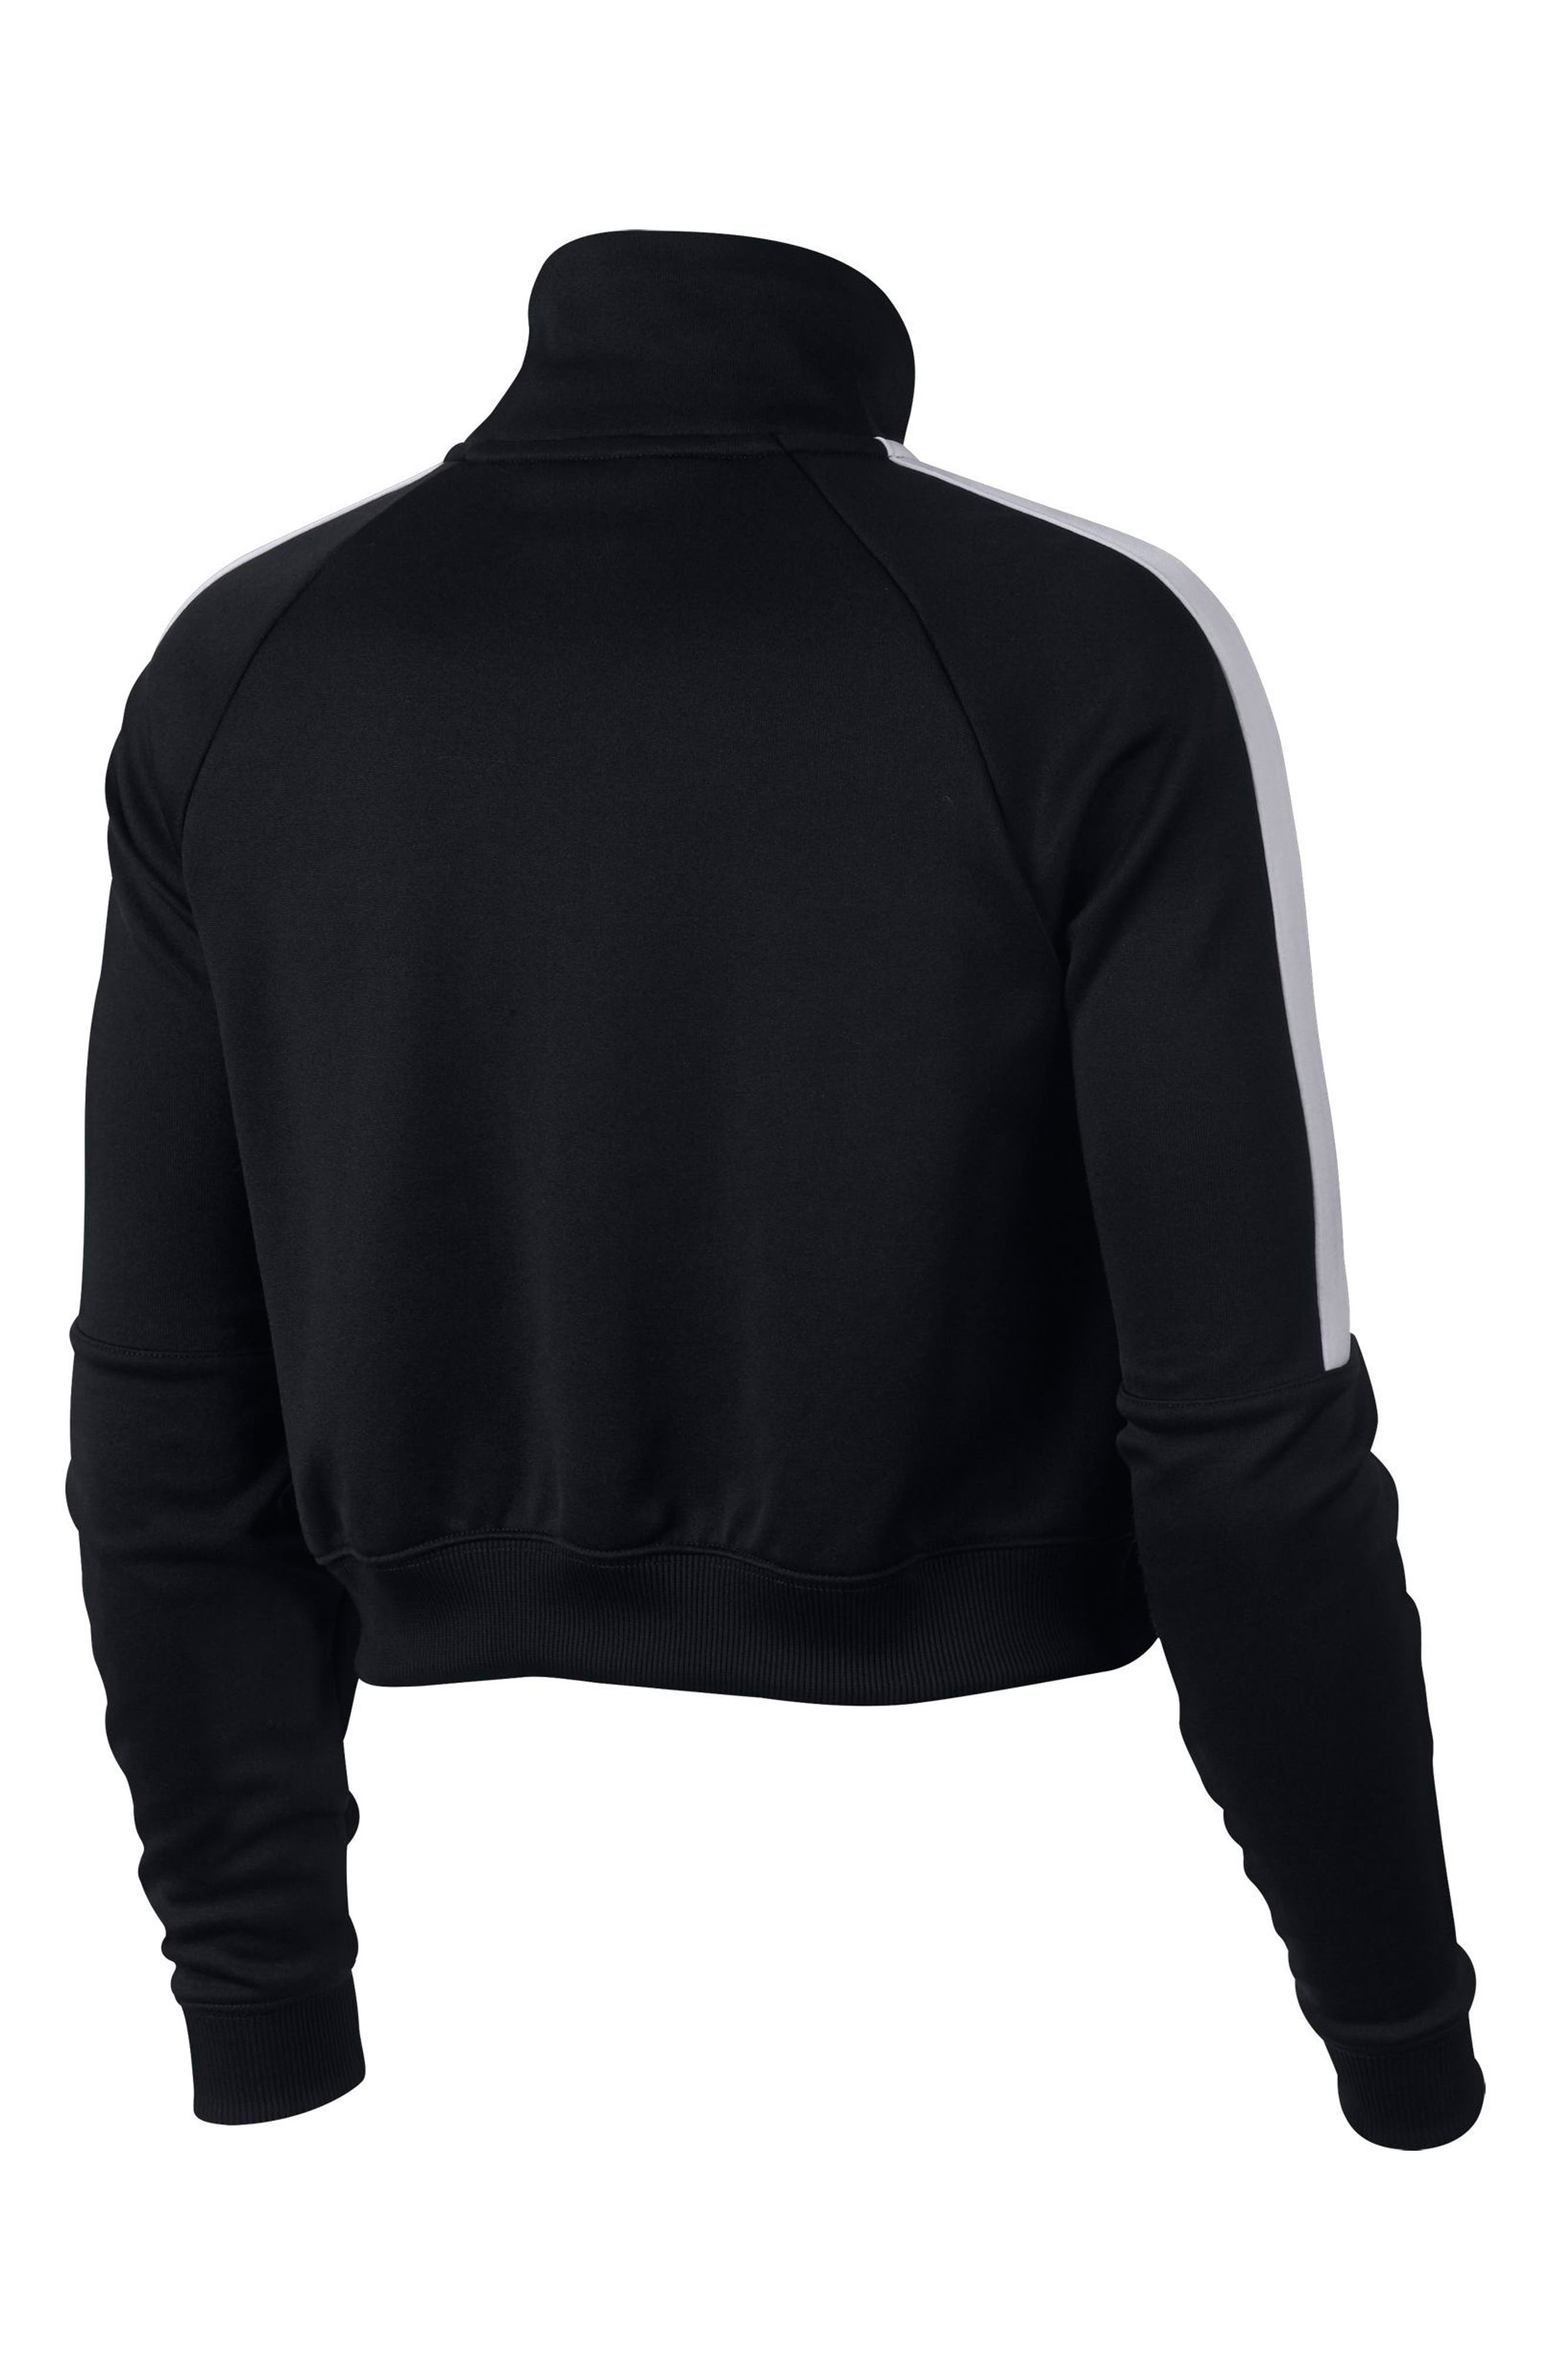 Sportswear N98 Jacket,                             Alternate thumbnail 16, color,